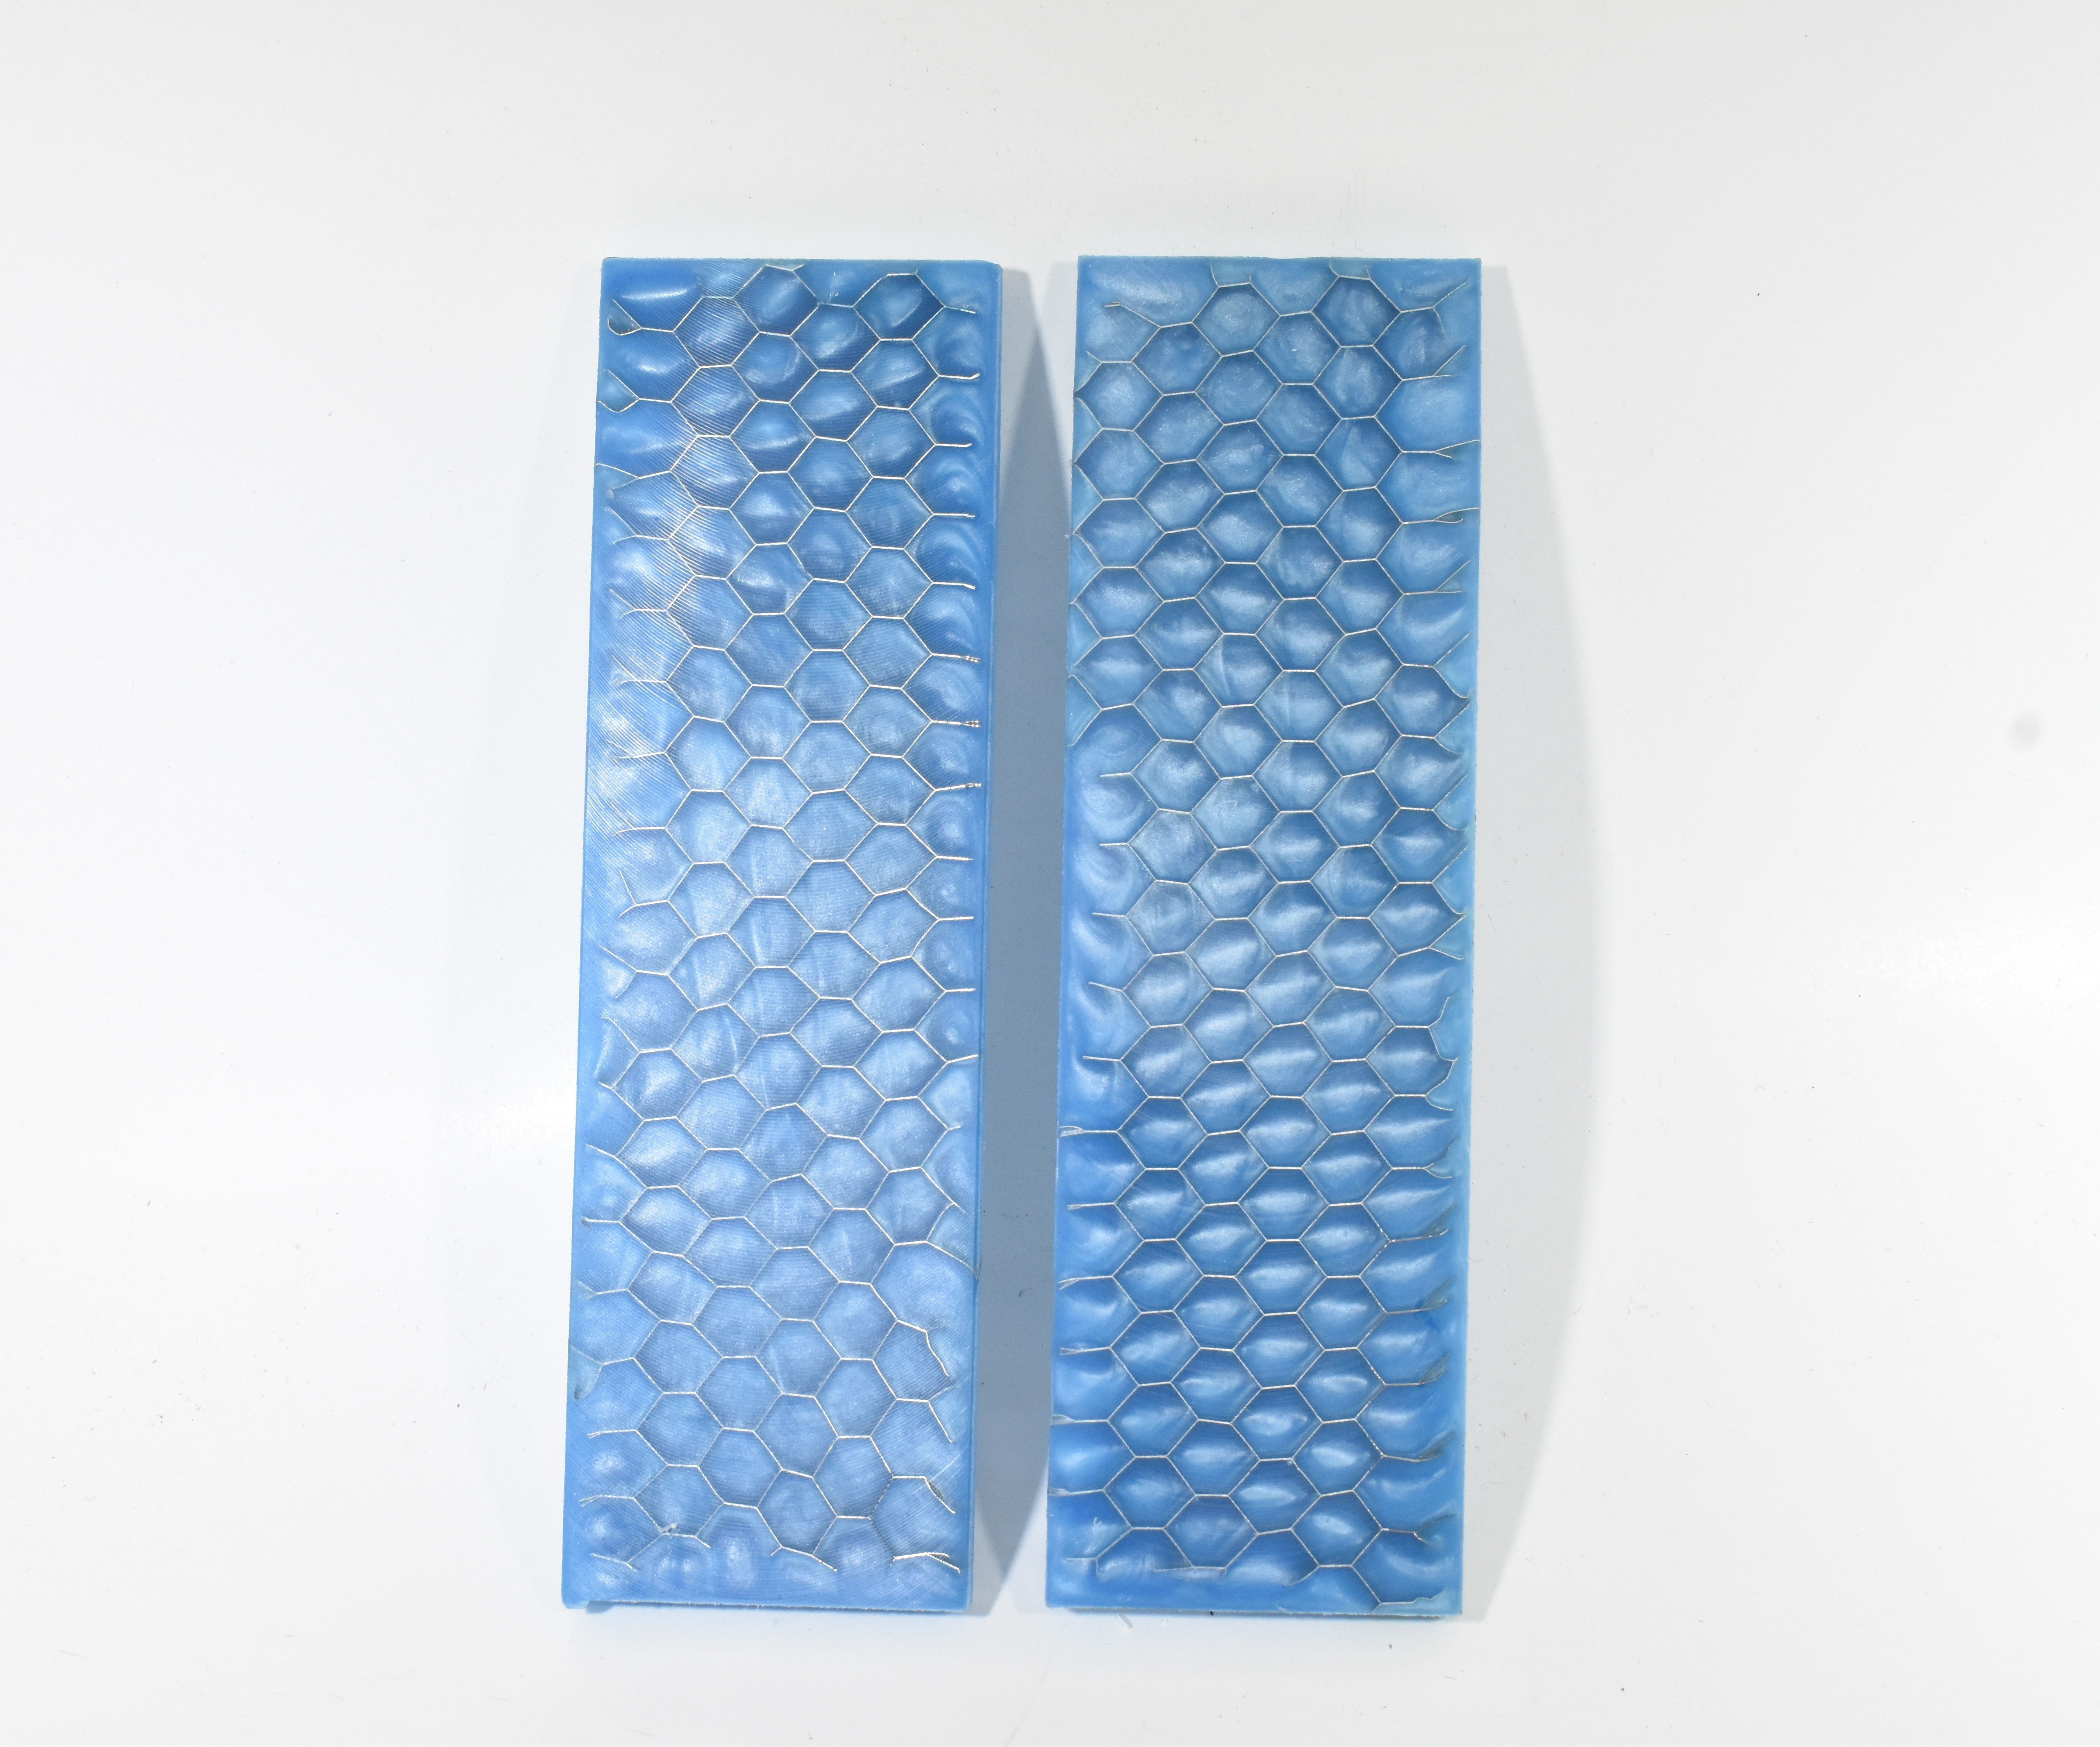 Making Cast Resin Aluminium Honeycomb Knife Scales